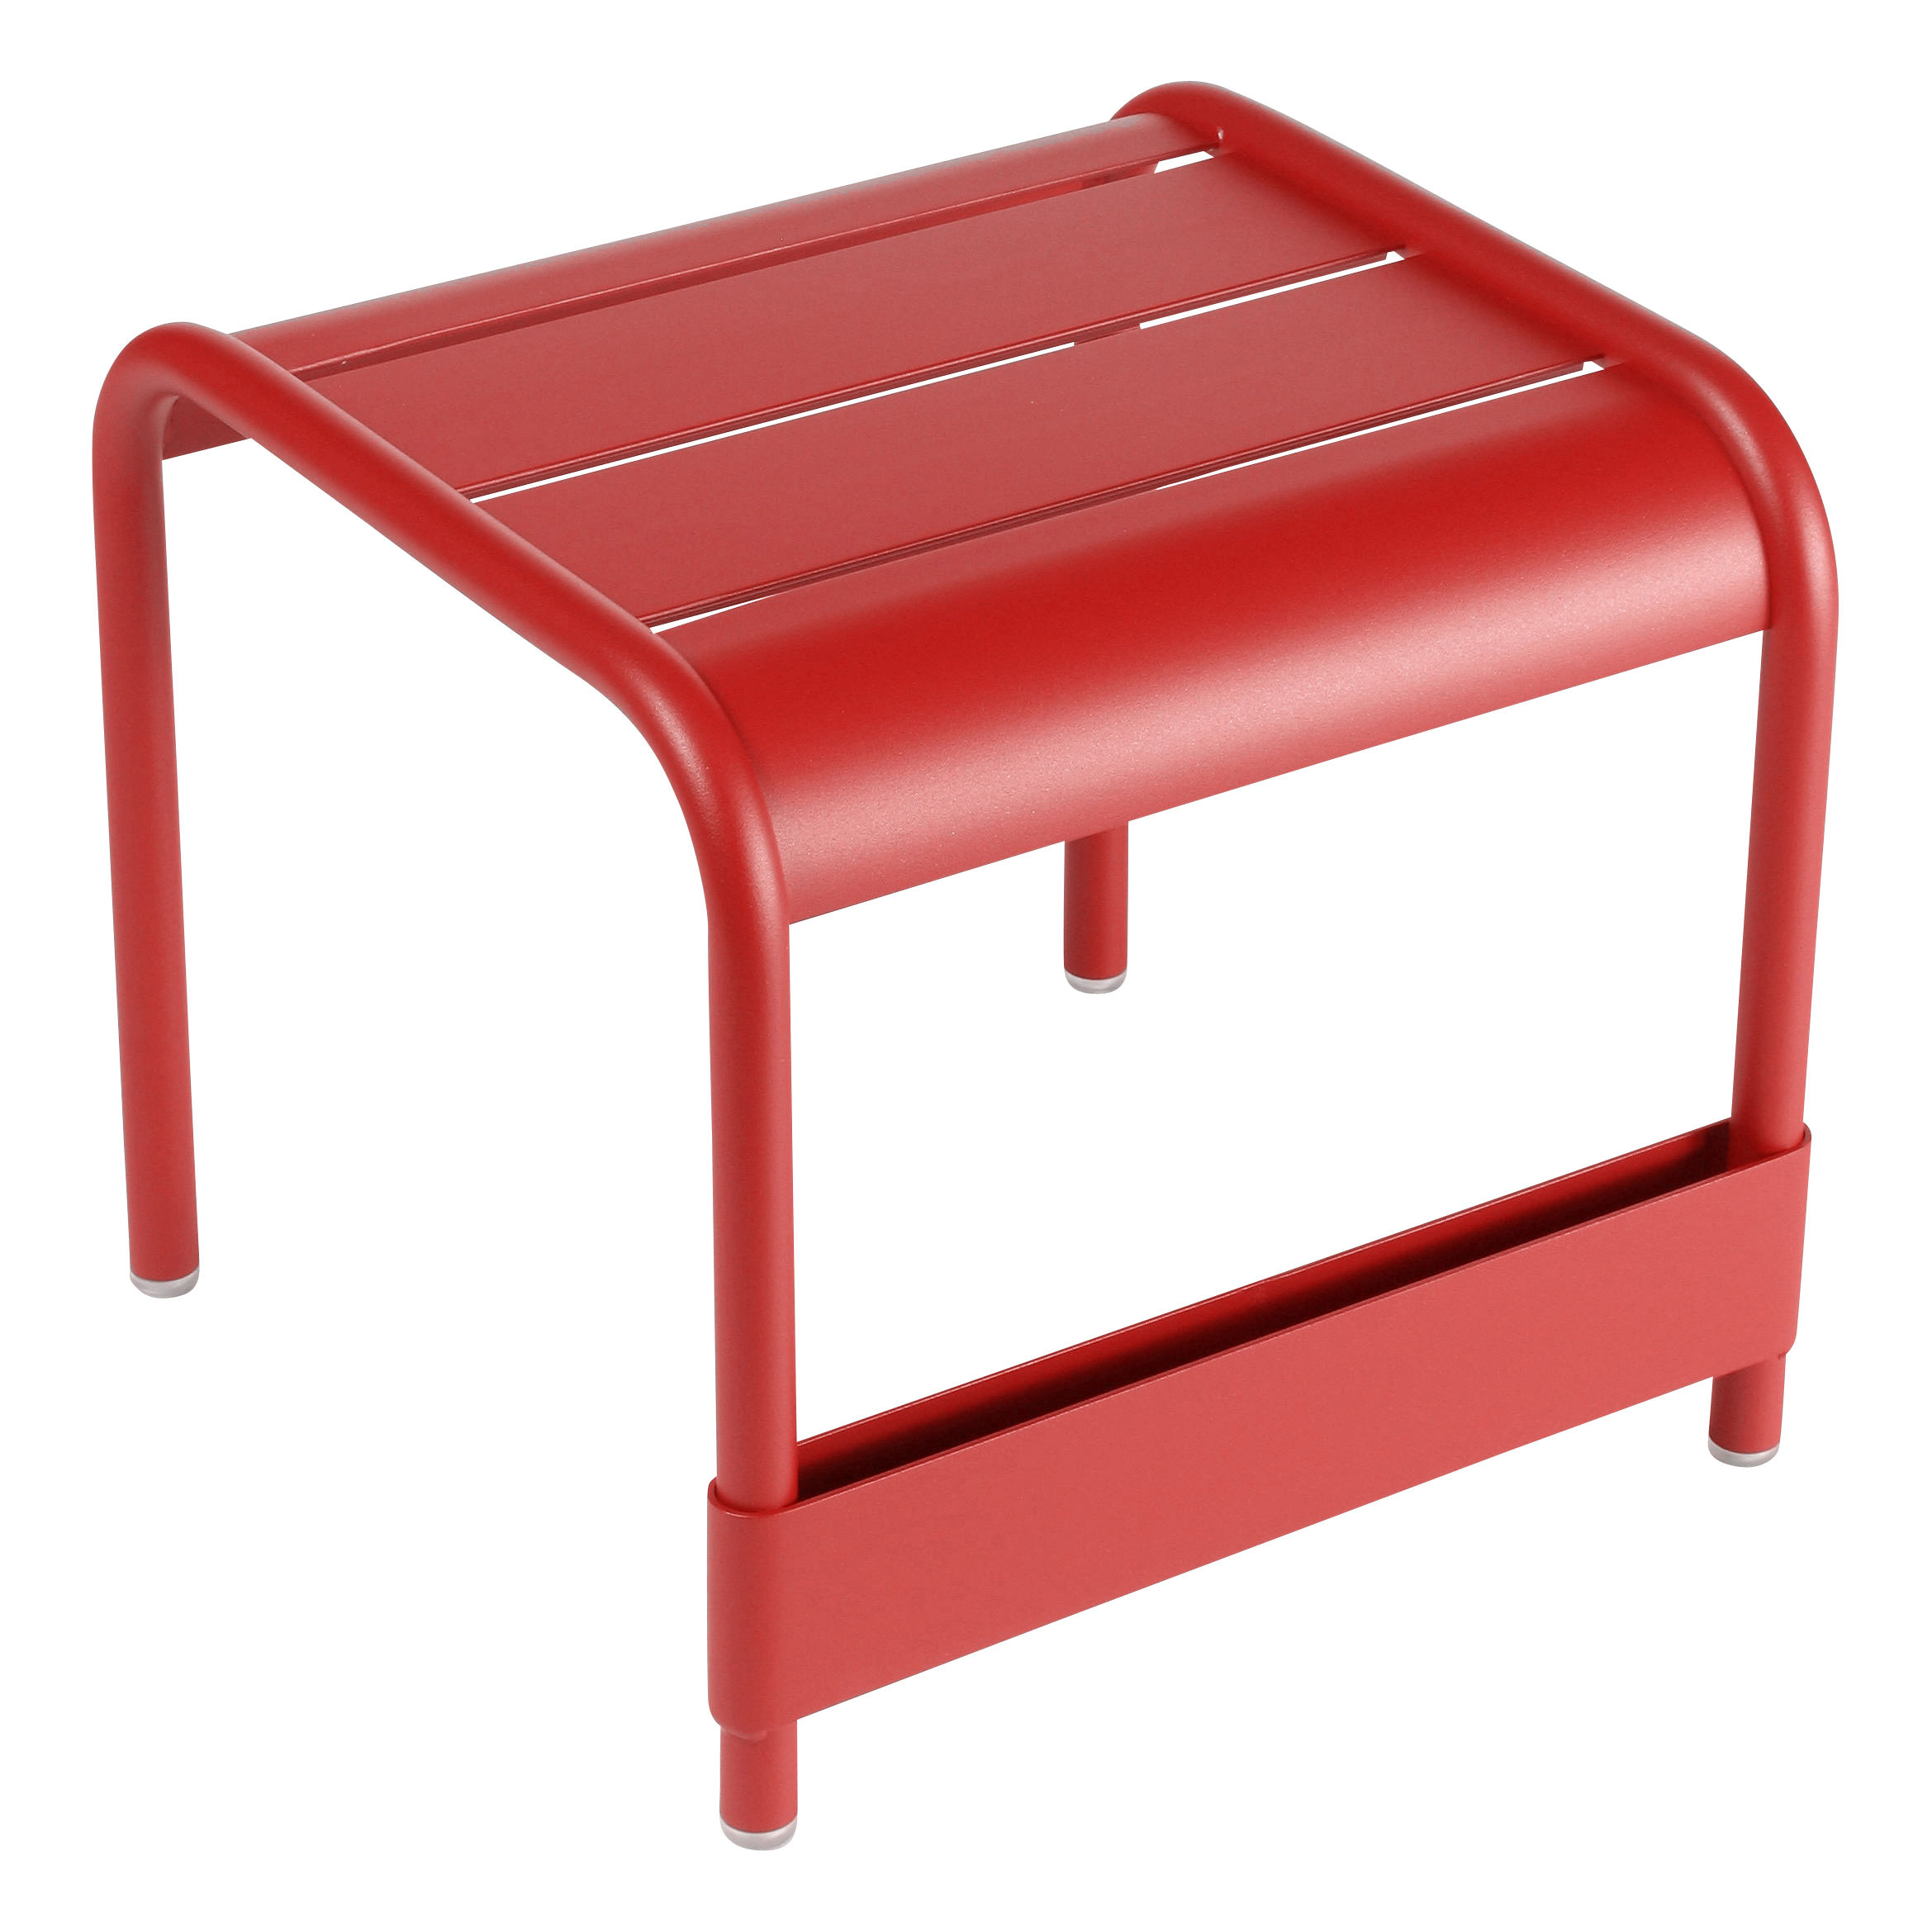 Life Style - Table d'appoint Luxembourg / Pouf - L 42 cm - Fermob - Coquelicot - Aluminium laqué